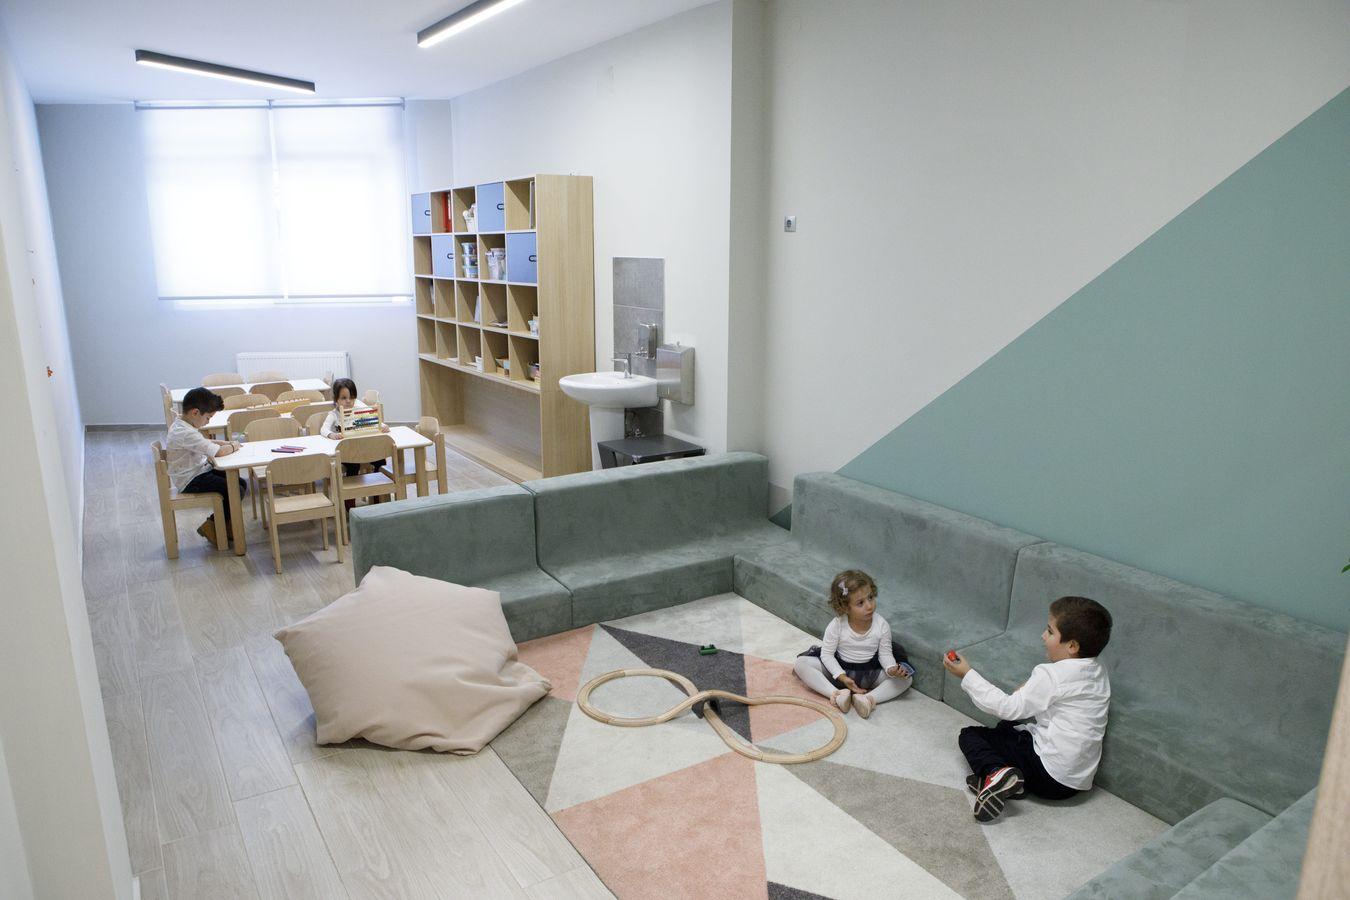 BabyEcoDesign Project: Aνακαινιση με παιδοκεντρικο σχεδιασμο Νηπιαγωγειου της Αδαμαντιου Σχολης 2/2